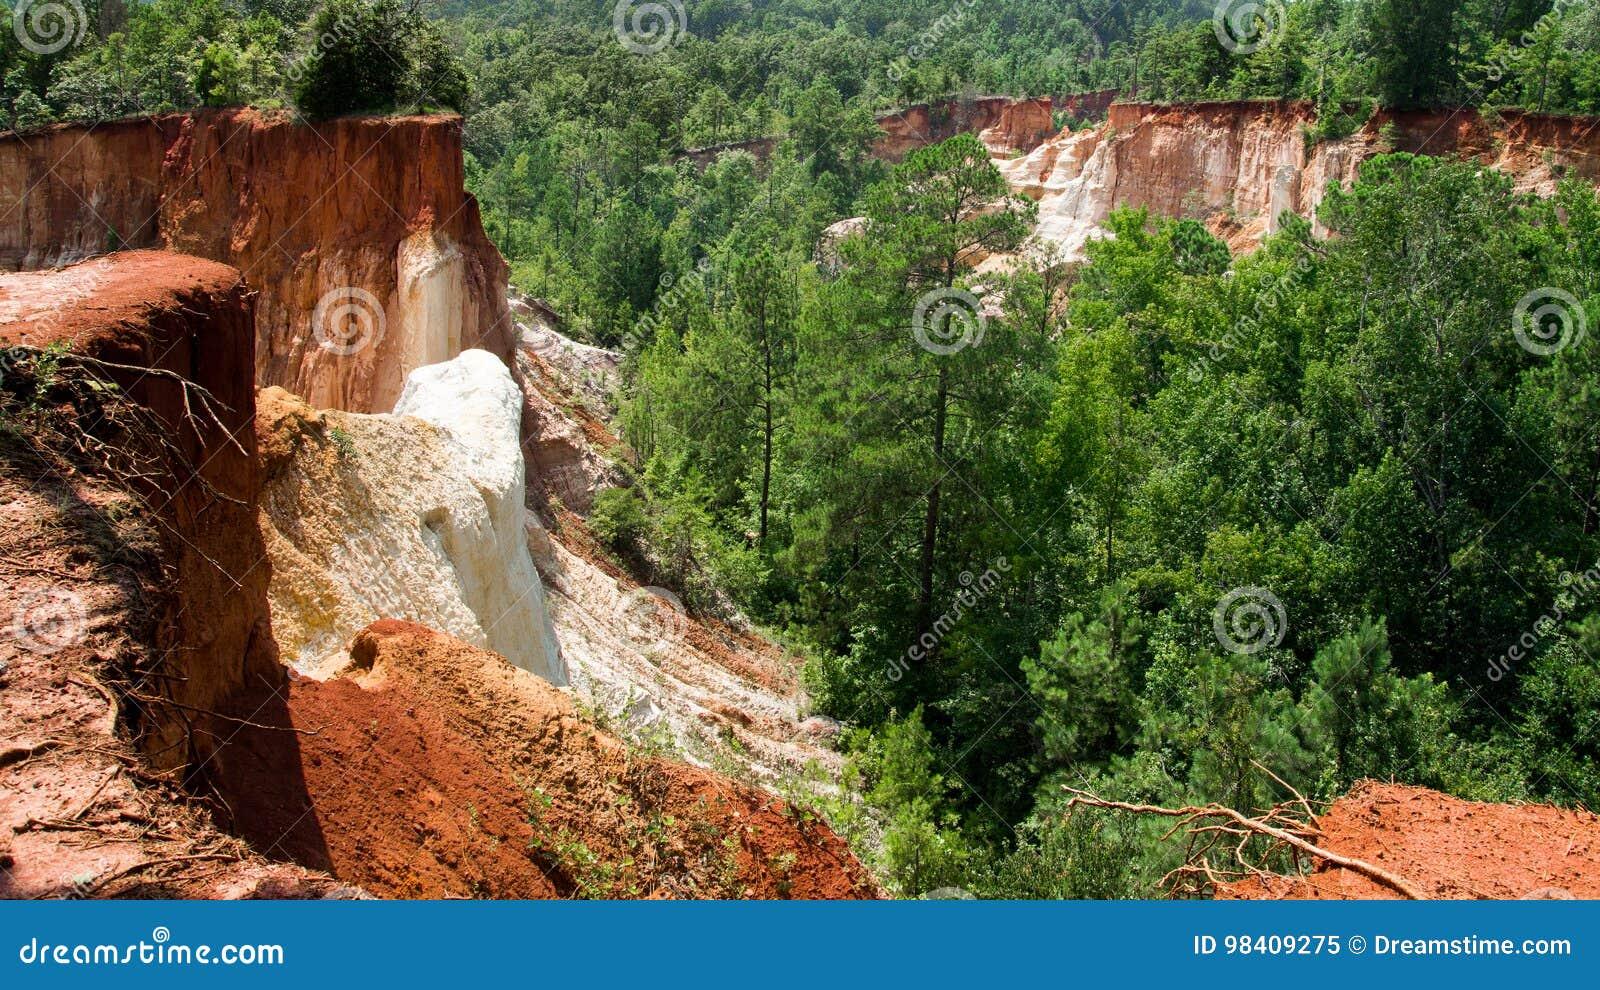 Download Providence Canyon, USA stock image. Image of nature, tourism - 98409275